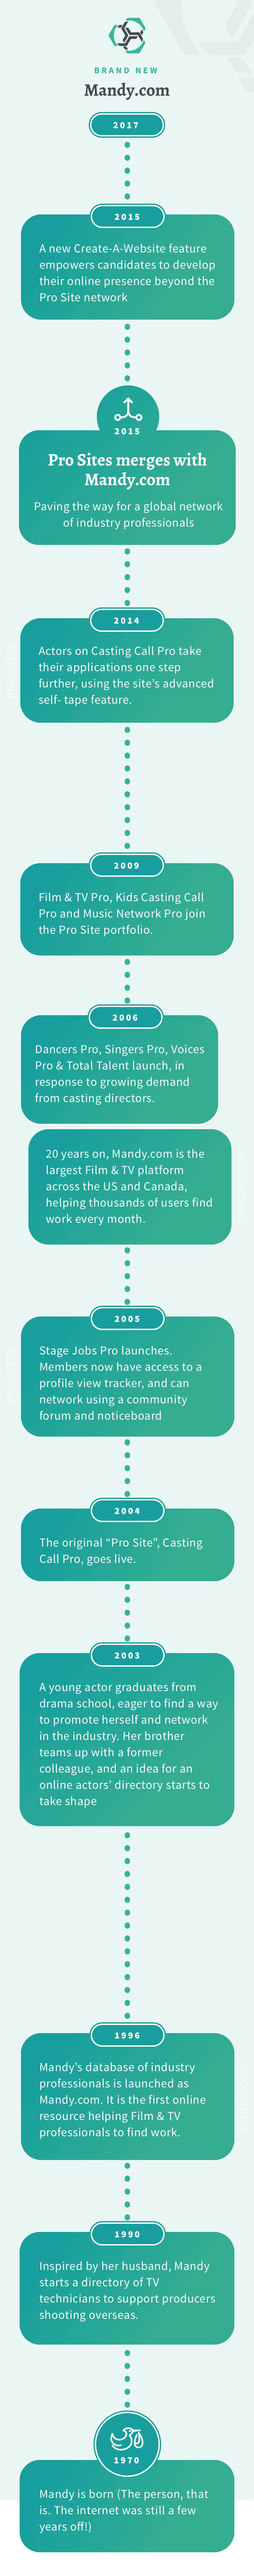 Infographics about Mandy.com